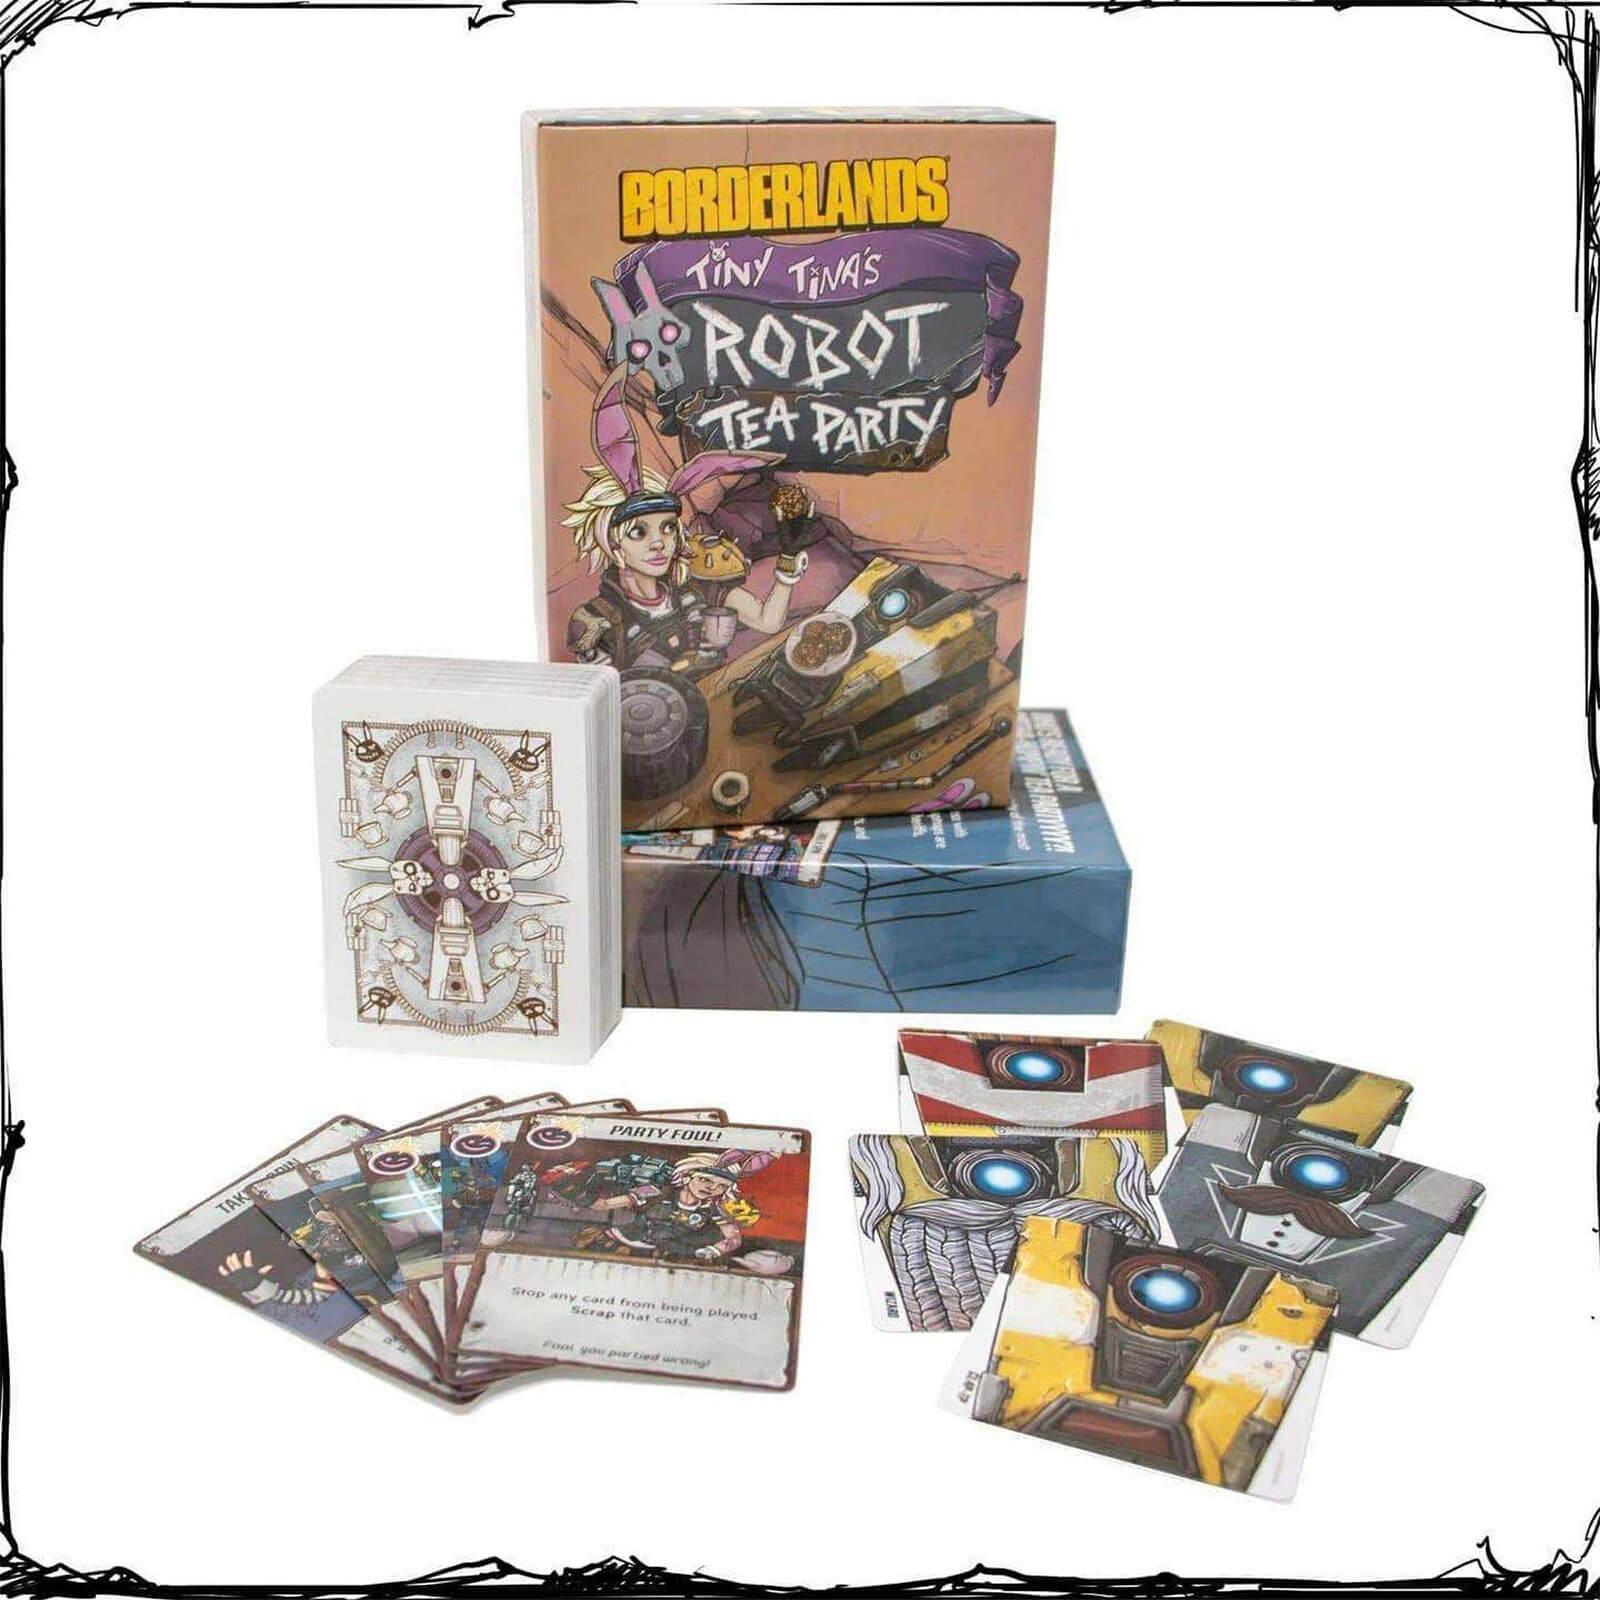 Image of Borderlands: Tiny Tina's Robot Tea Party Board Game